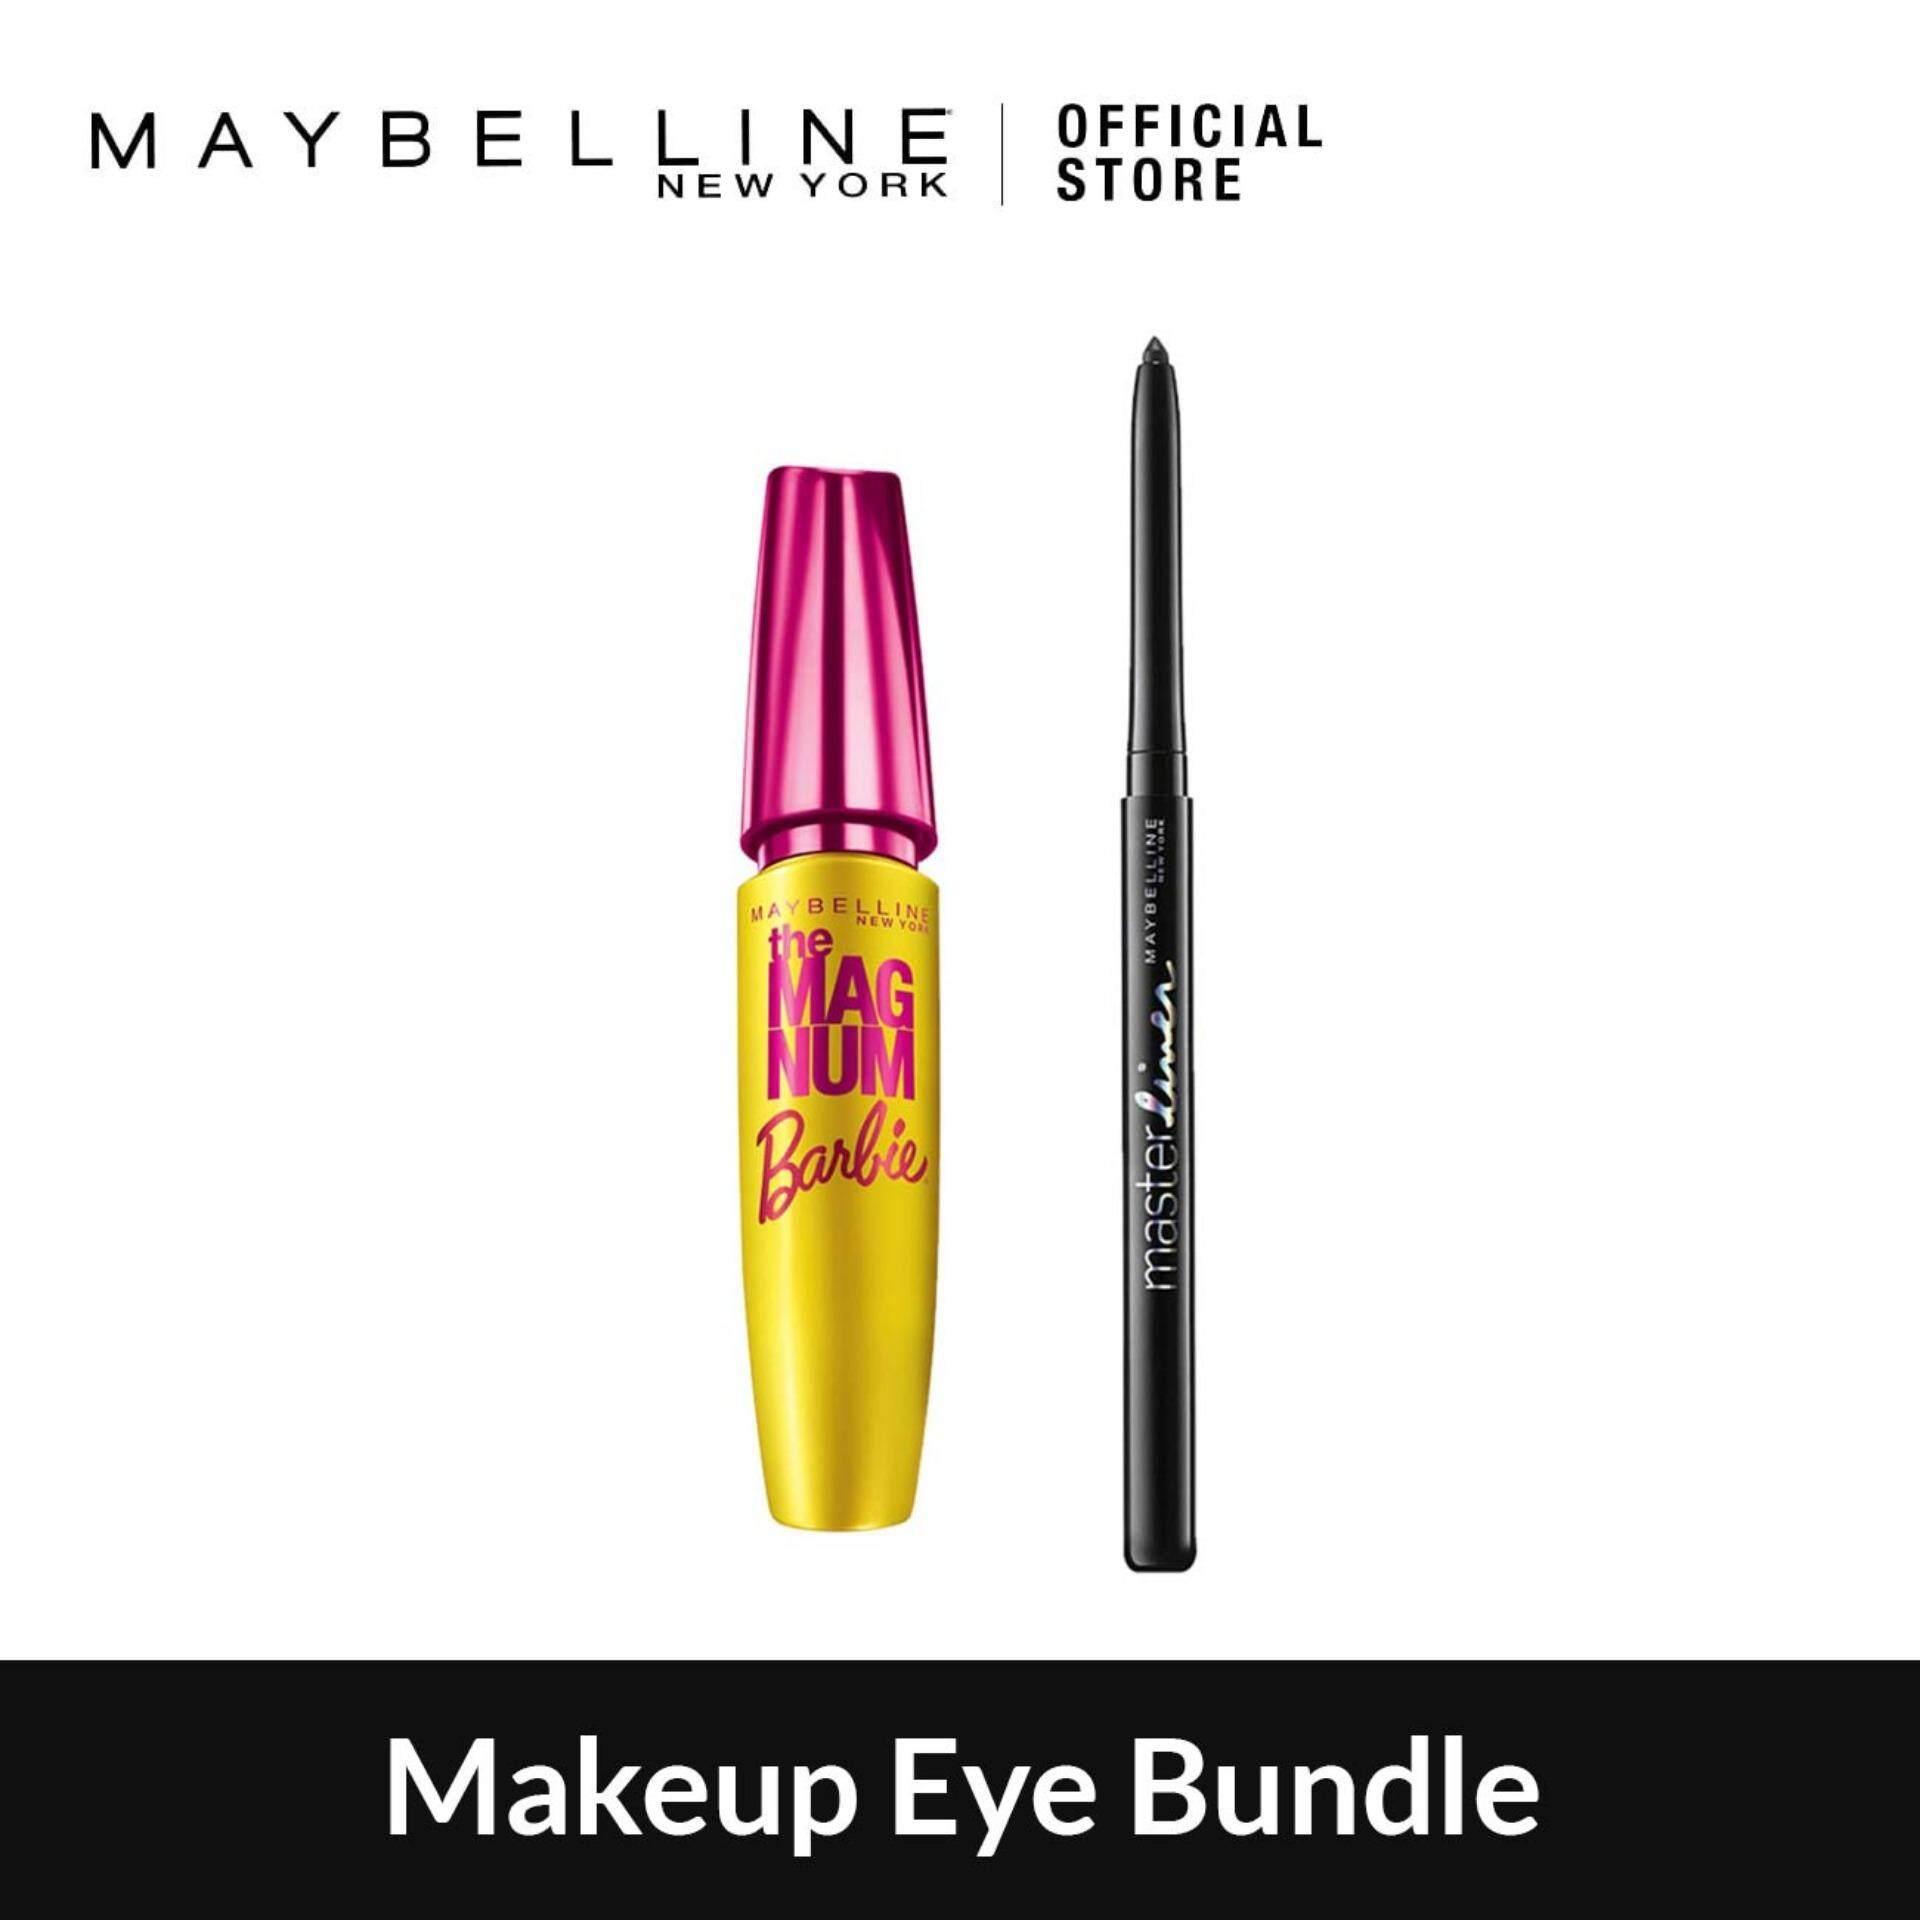 Maybelline Eyes Makeup Mascaras Price In Malaysia Best Barbie Mascara The Magnum Volum Express Waterproof Bold Eye Bundle